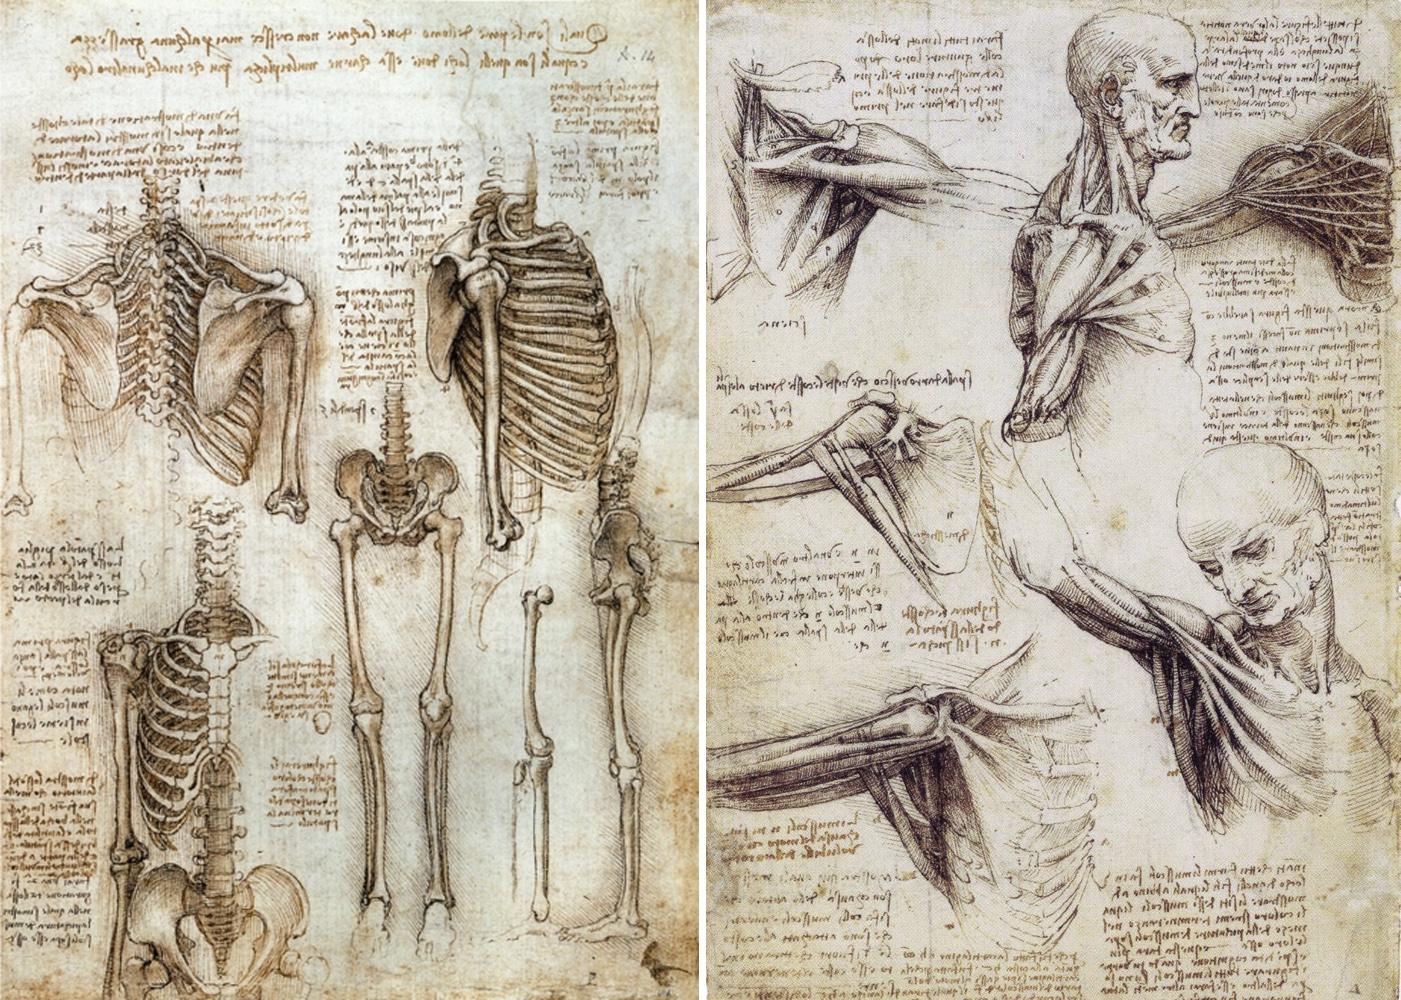 Leonardo-da-Vinci-the-Anatomical-Artist2.jpg